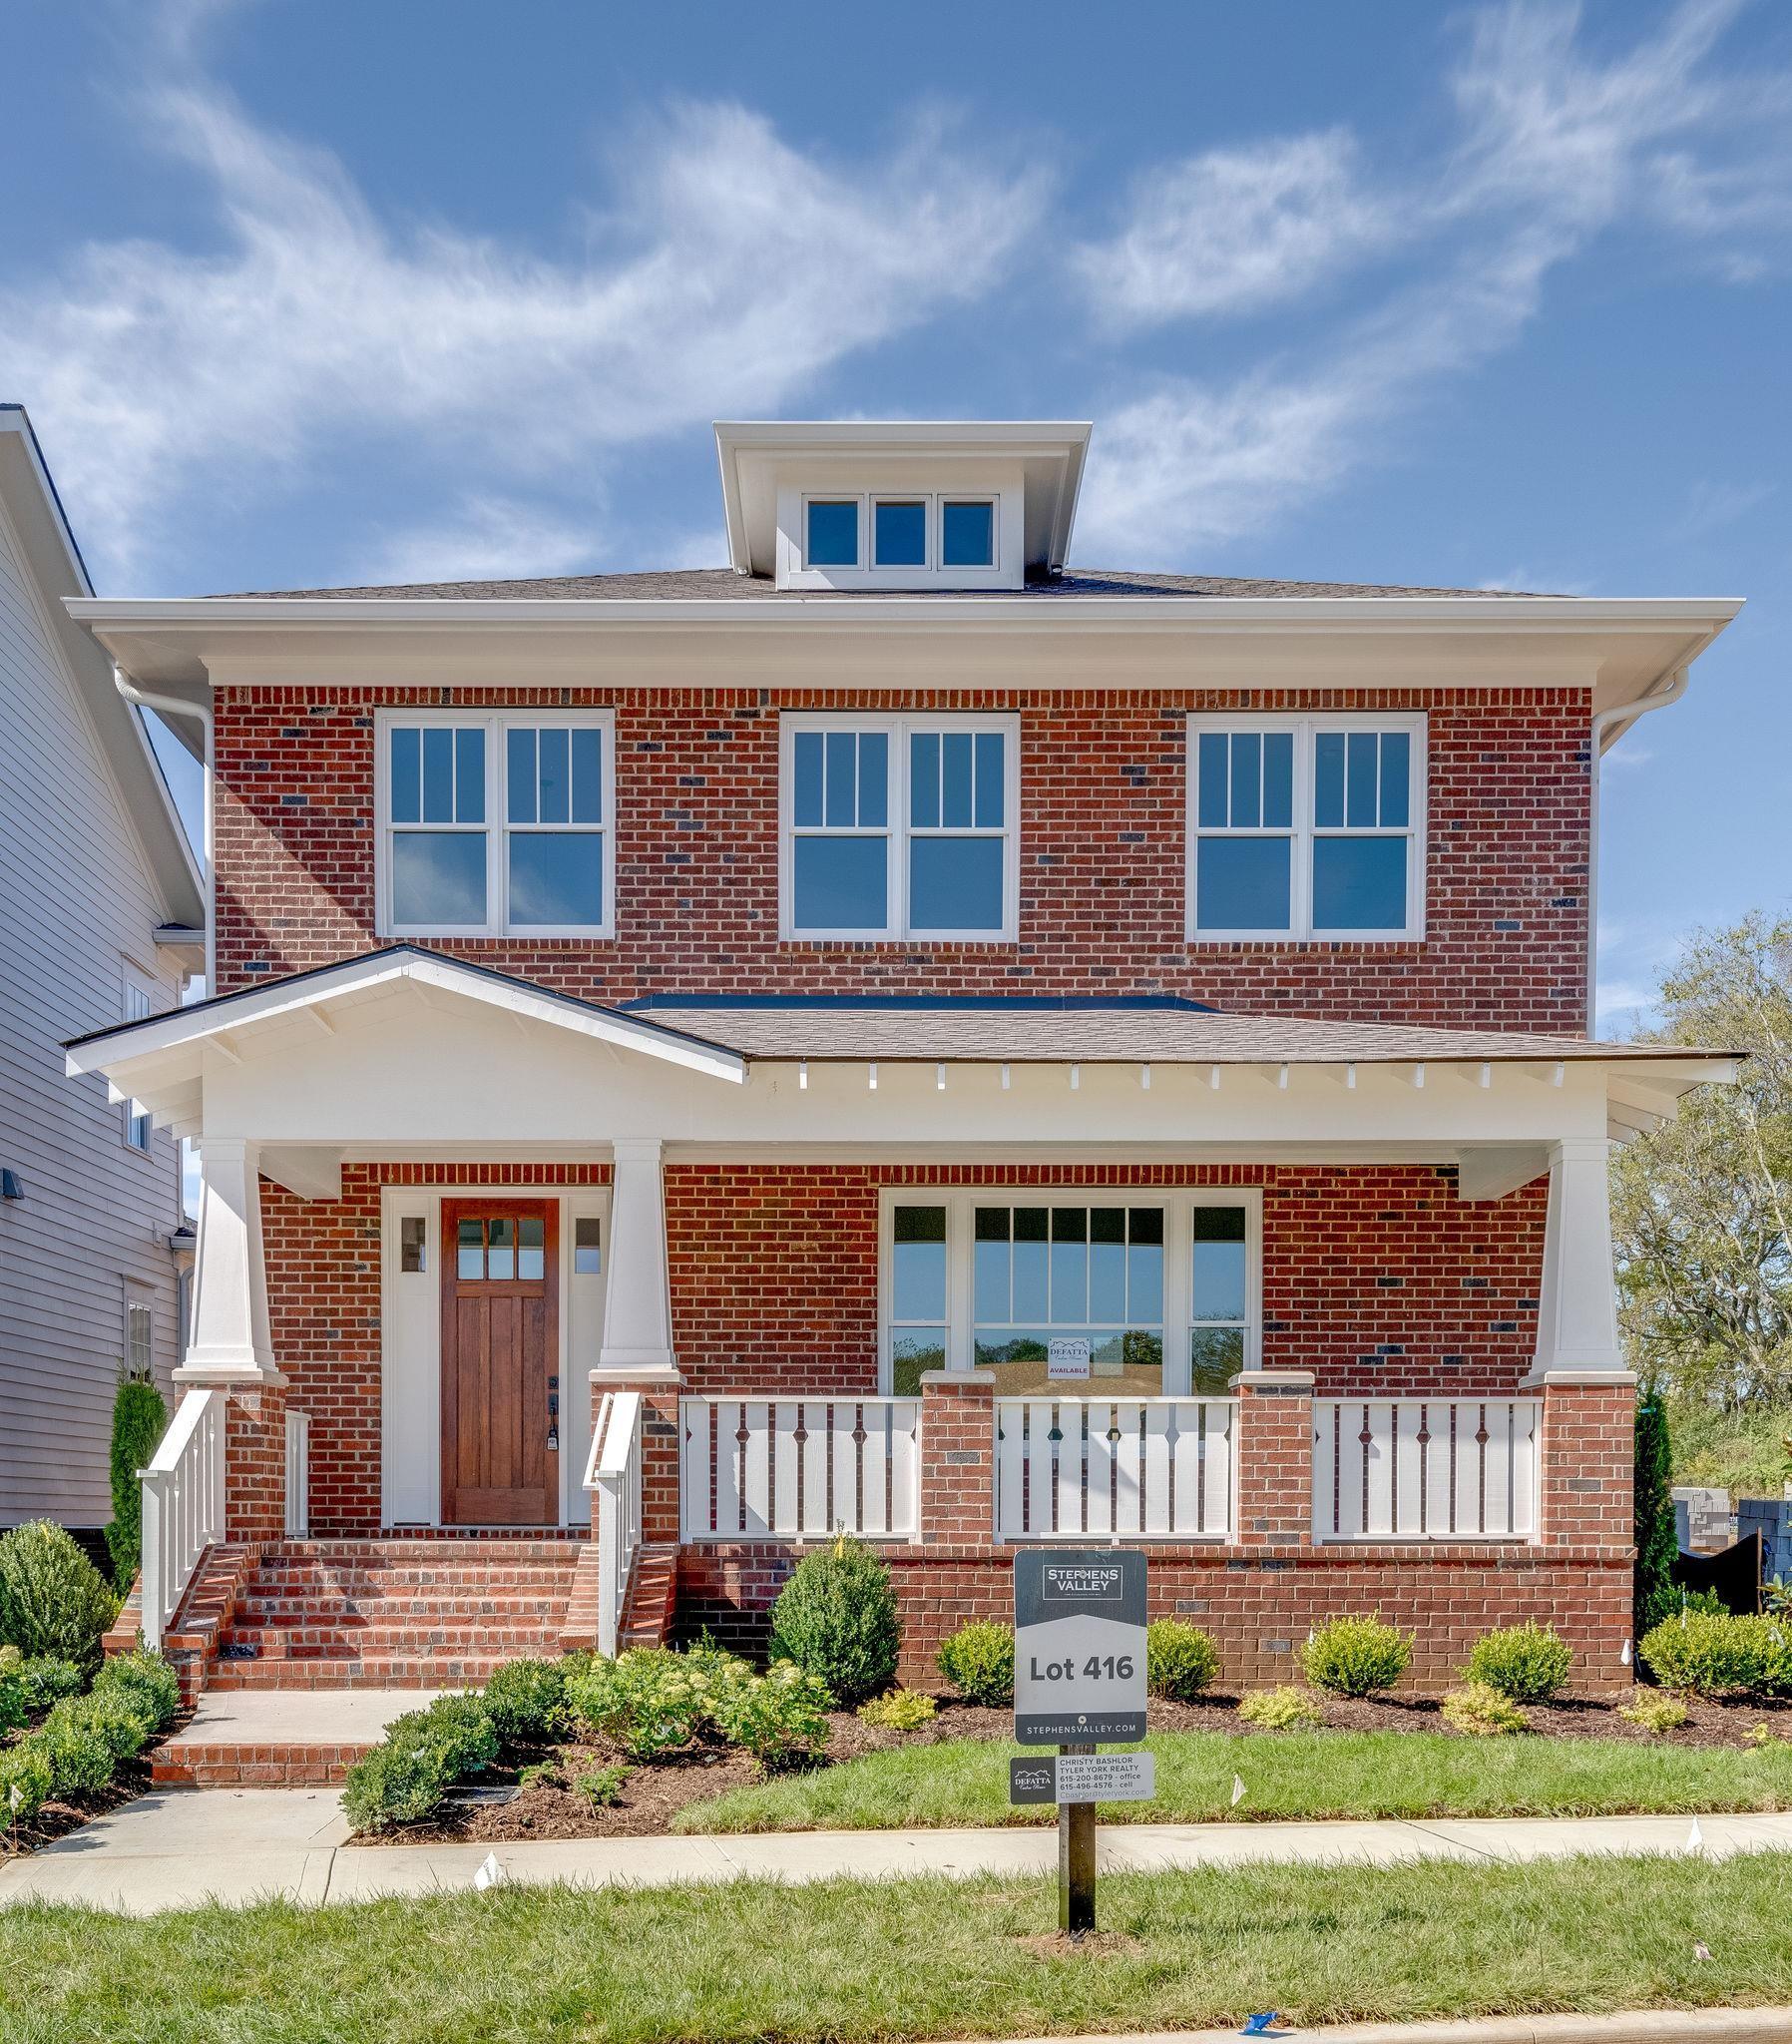 921 Dauphine Street- Lot 416, Nashville, TN 37221 - Nashville, TN real estate listing